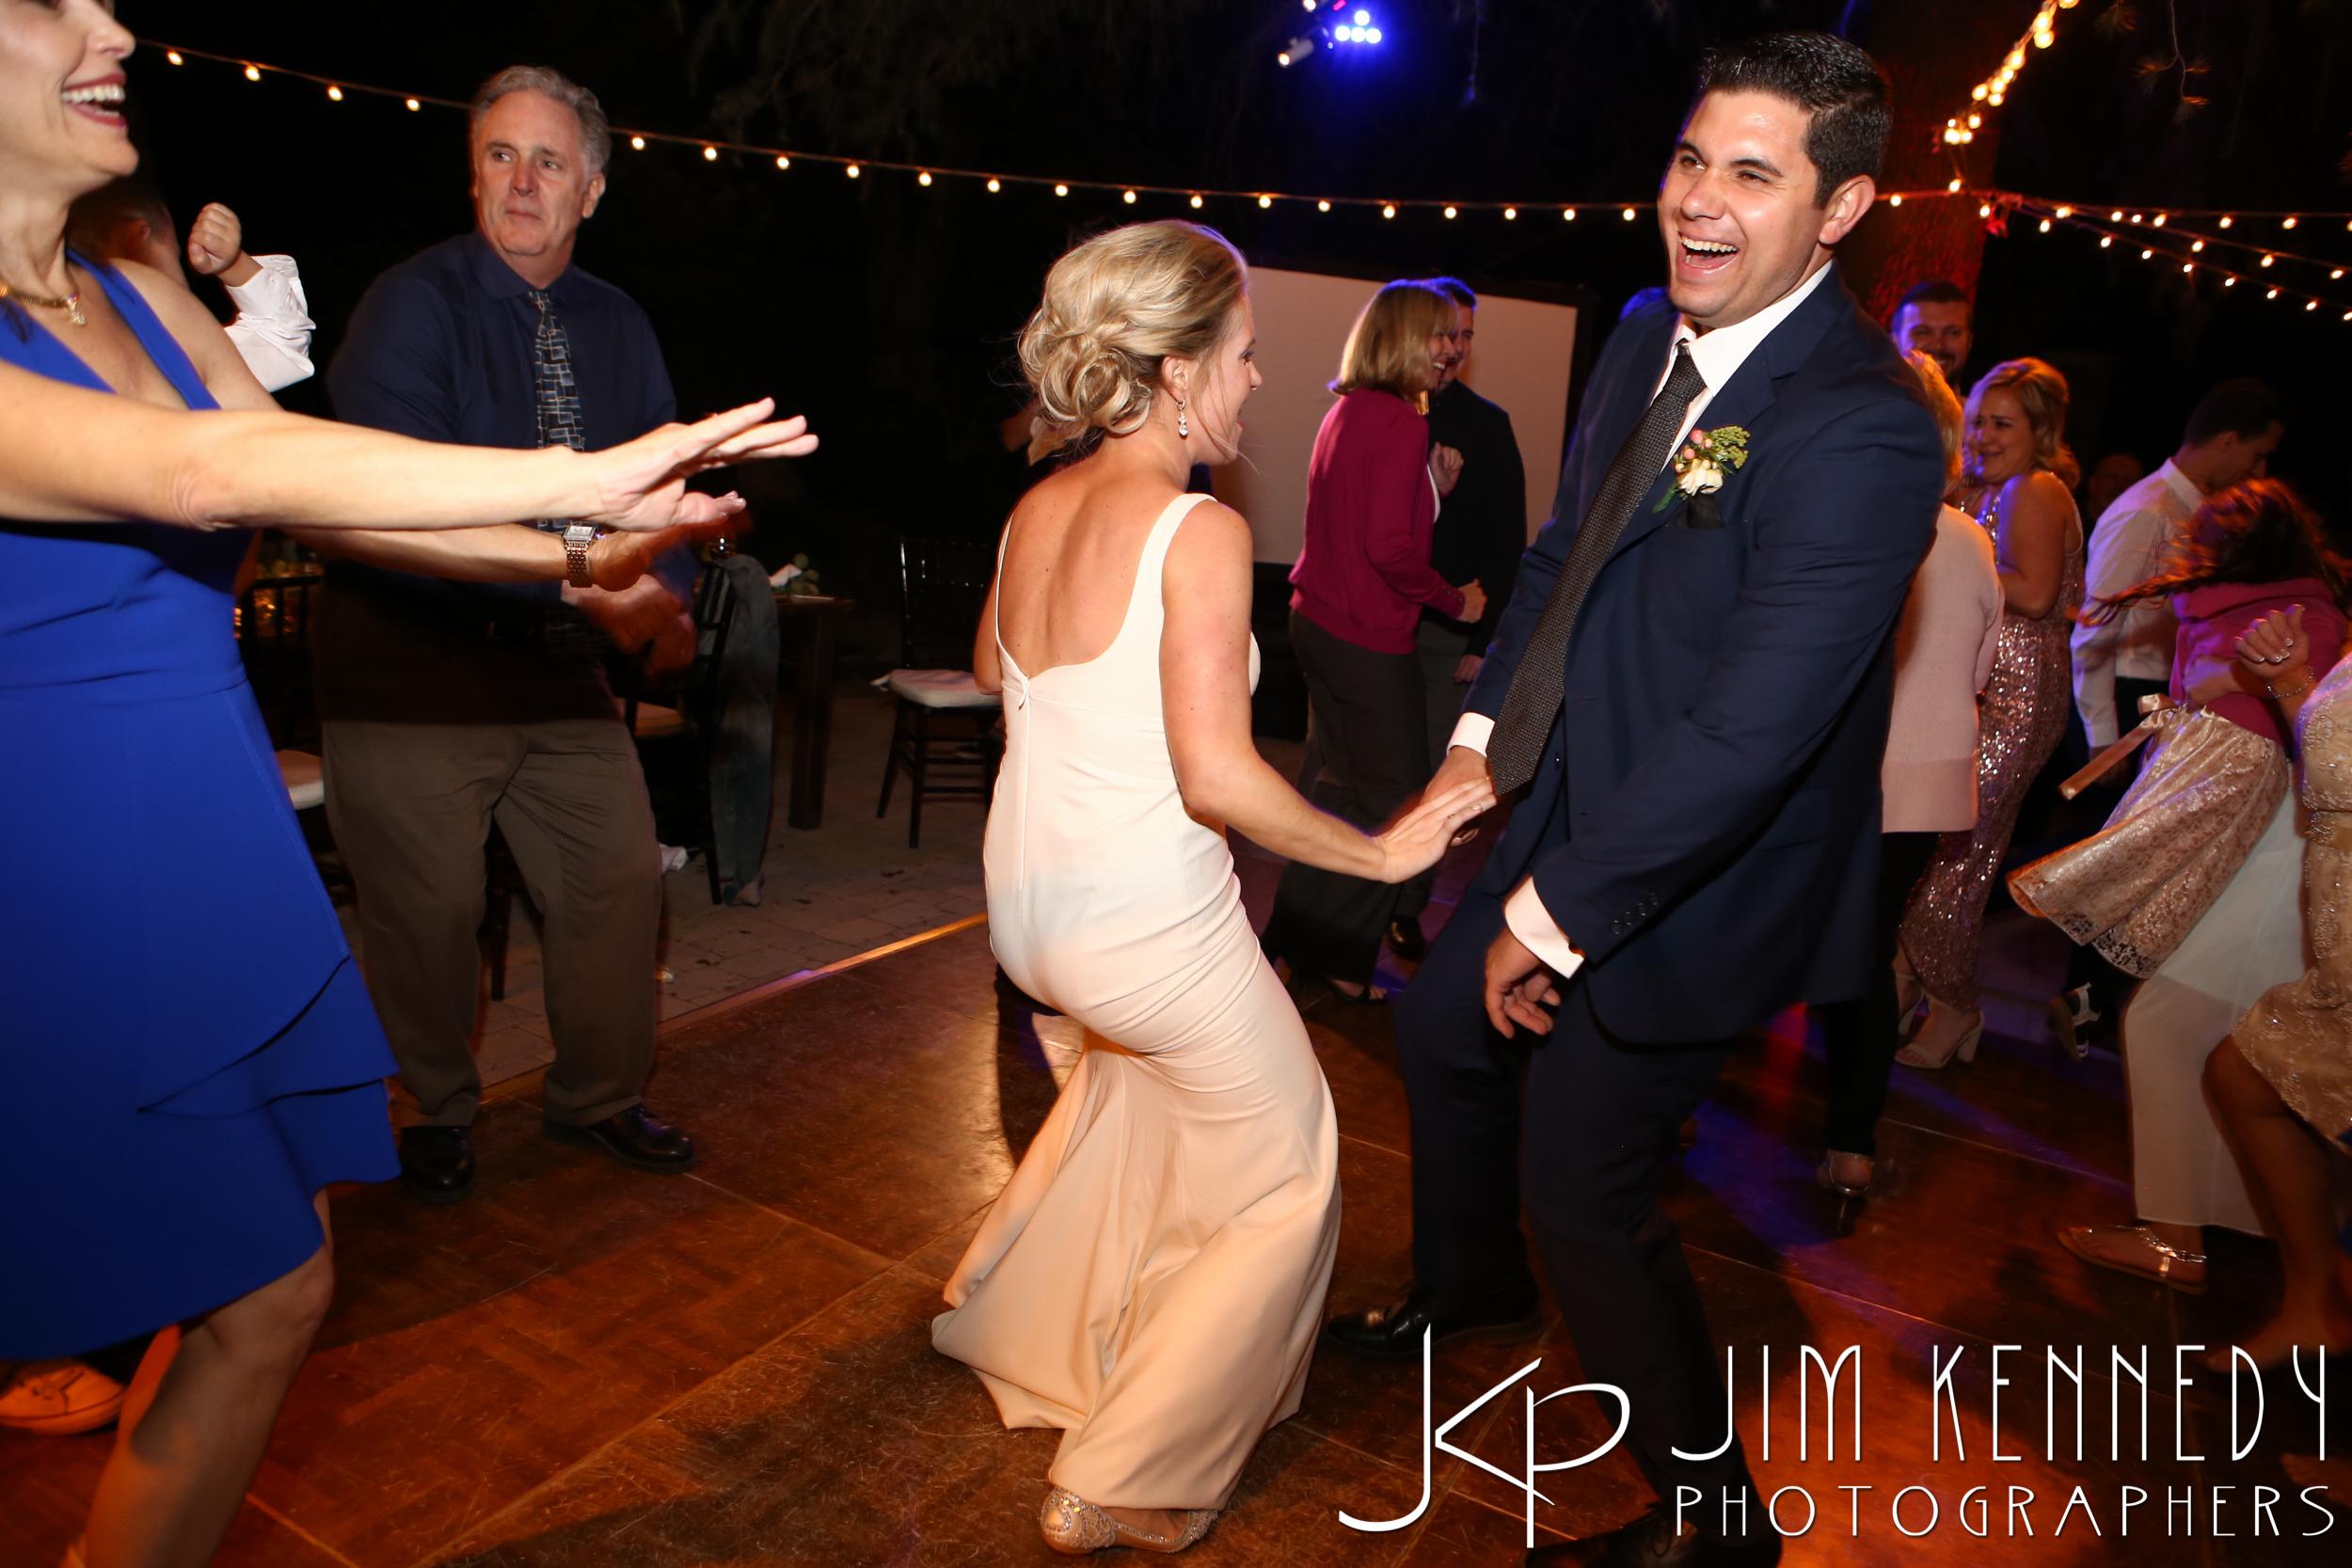 jim_kennedy_photographers_highland_springs_wedding_caitlyn_0202.jpg